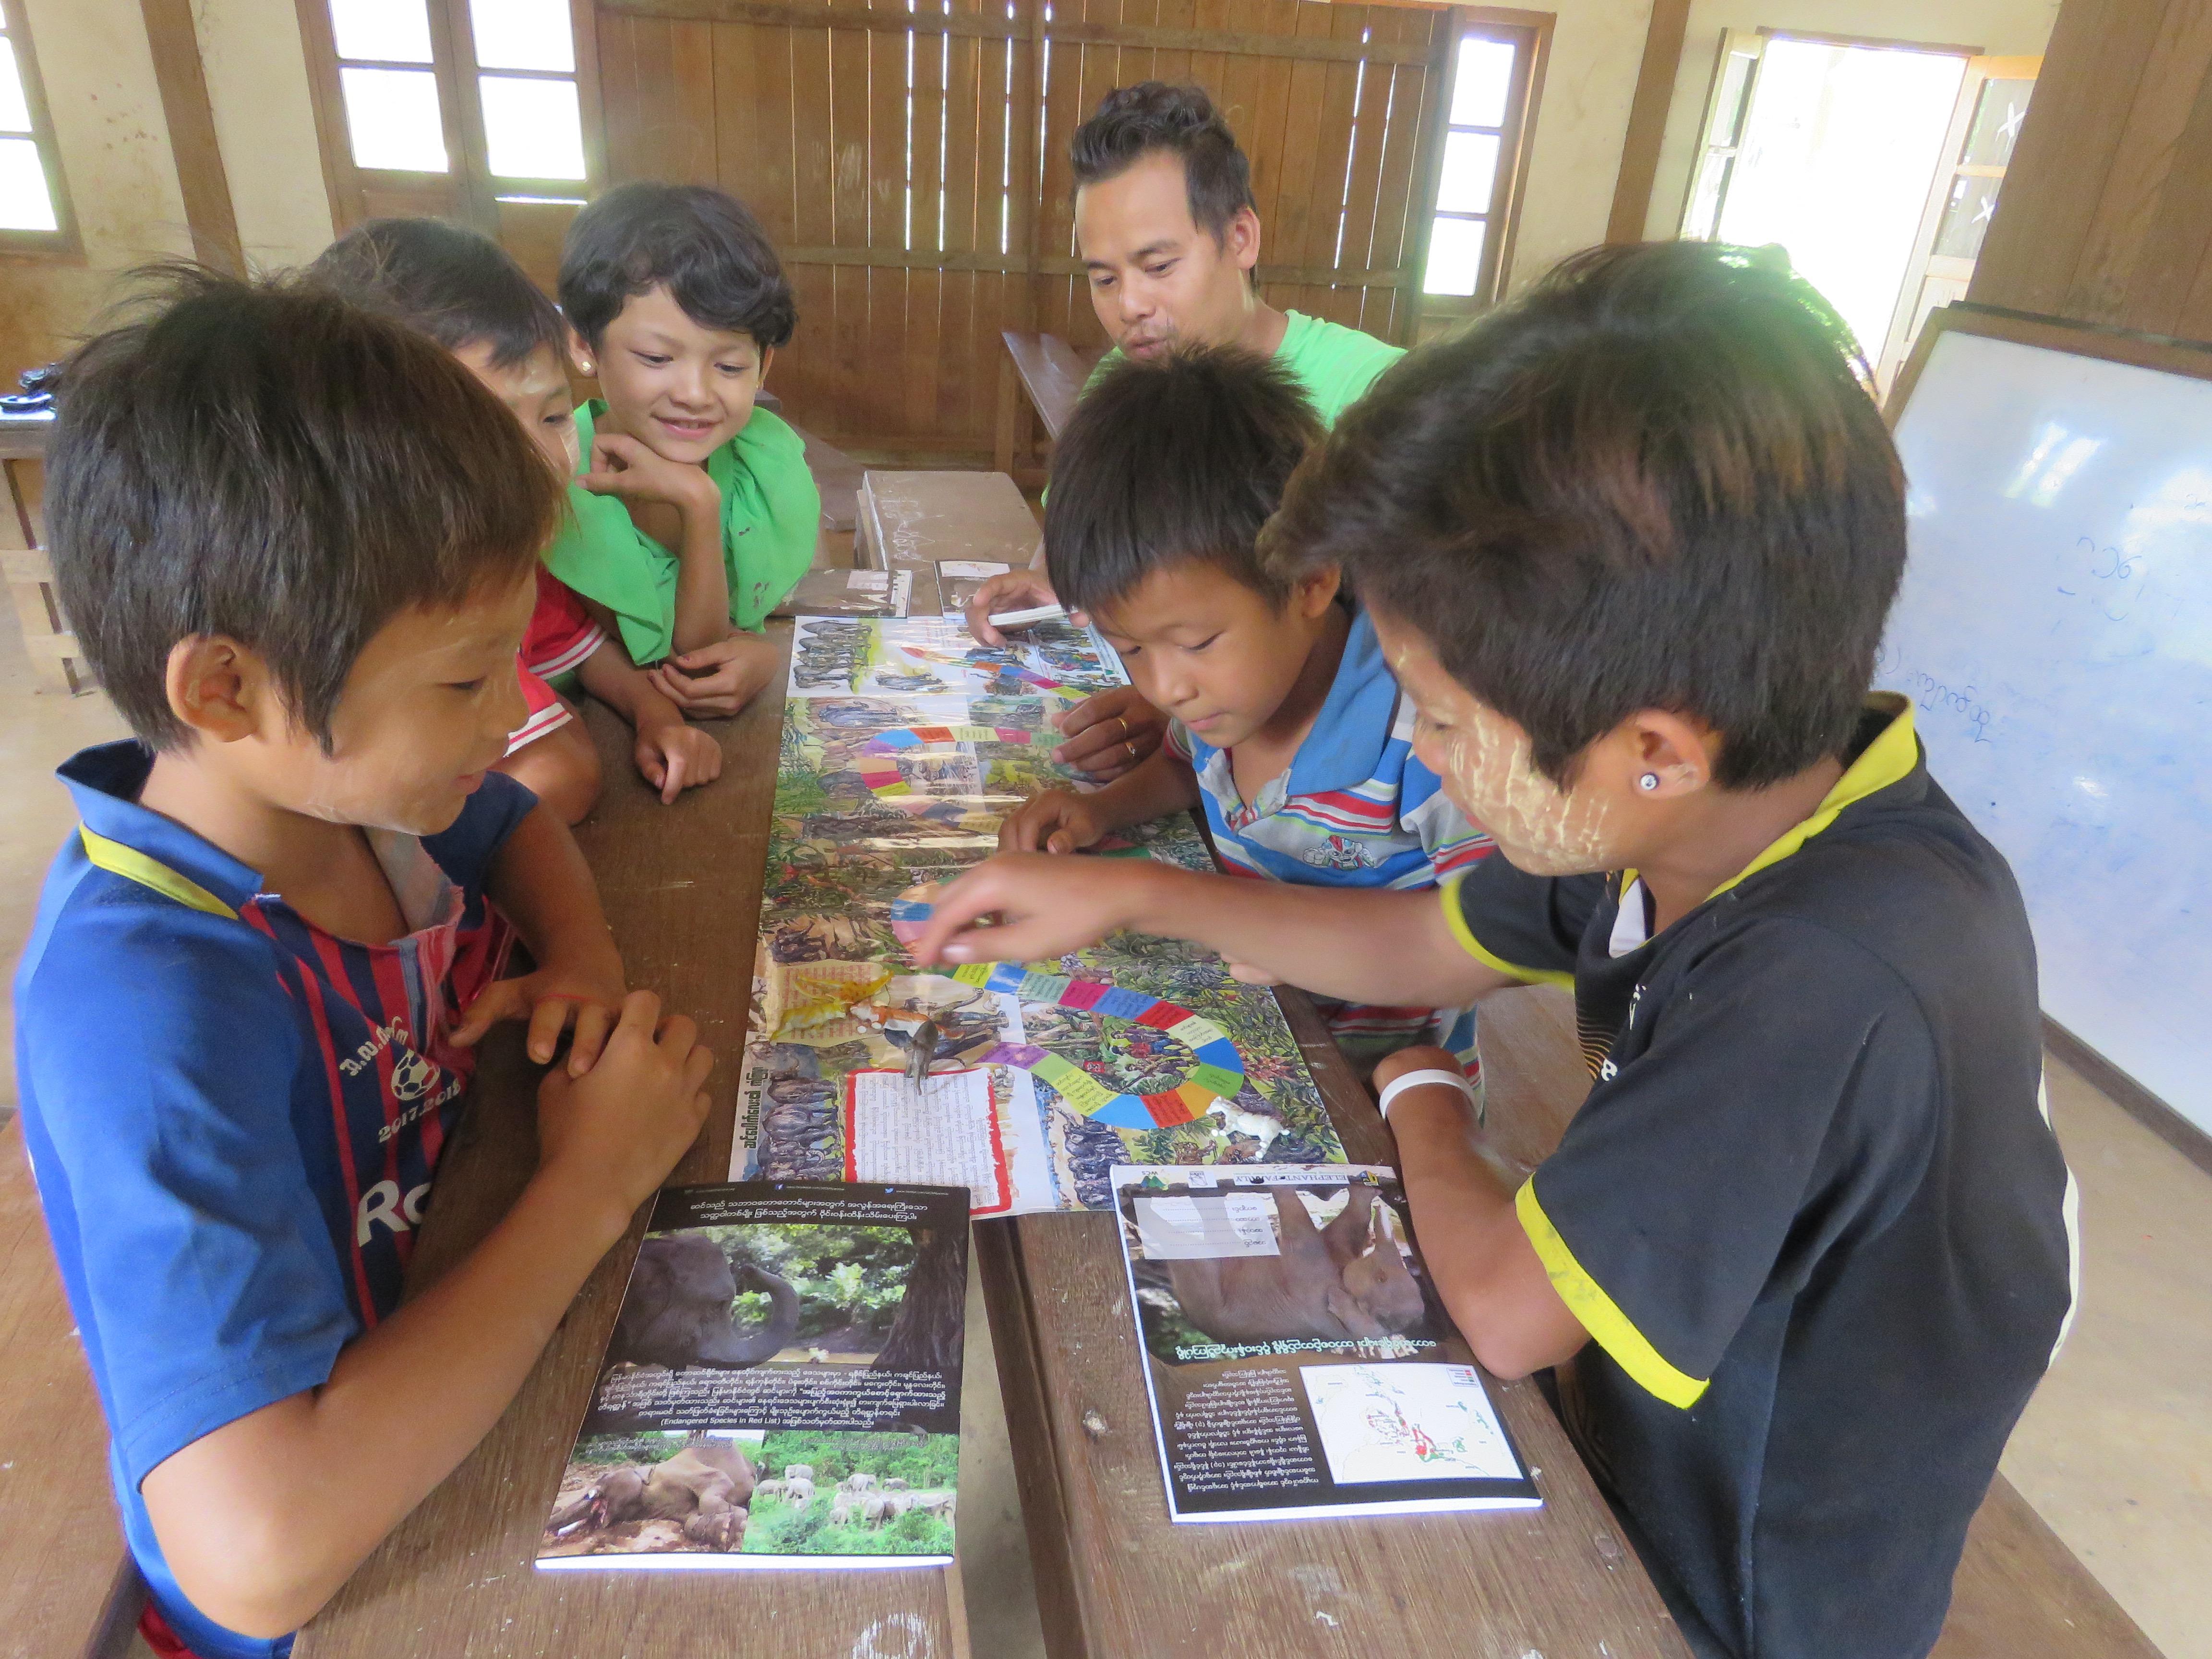 Burma 24-024 Children playing the WCS educational elephant board game, Credit WCS-Myanmar